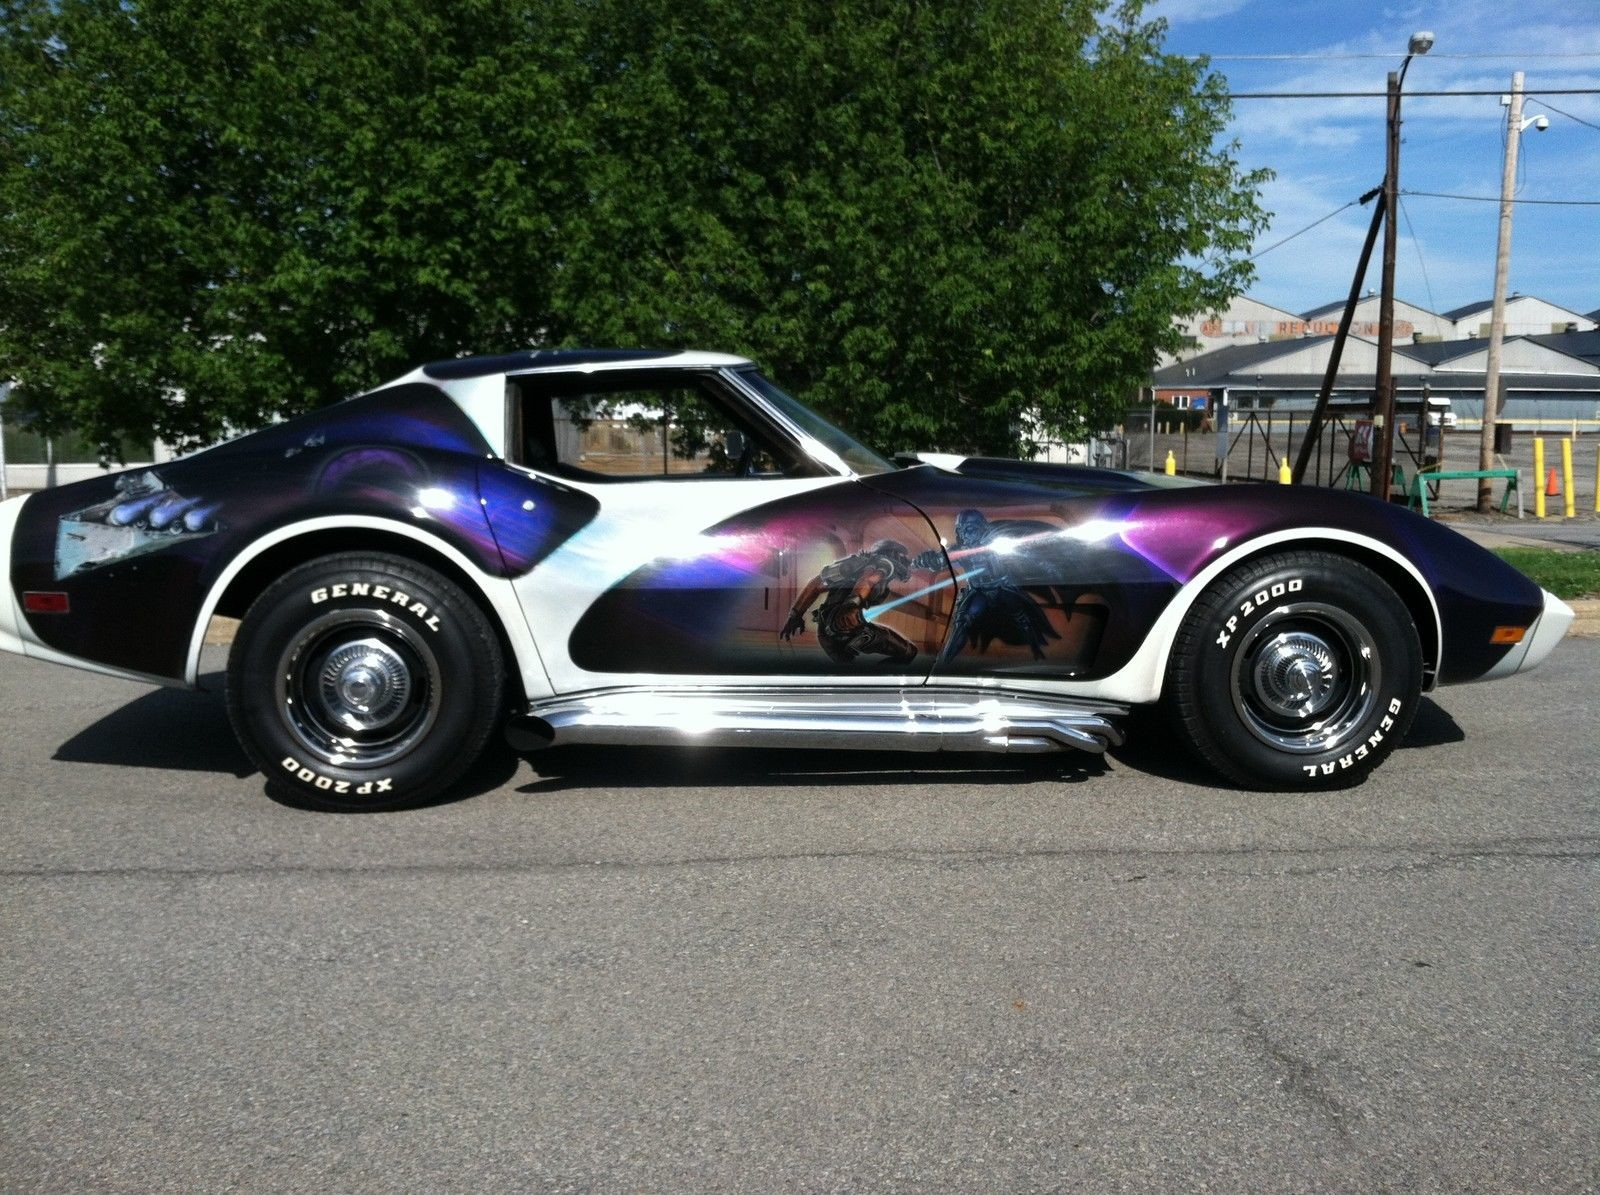 Top 13 Best & Craziest Star Wars Cars!